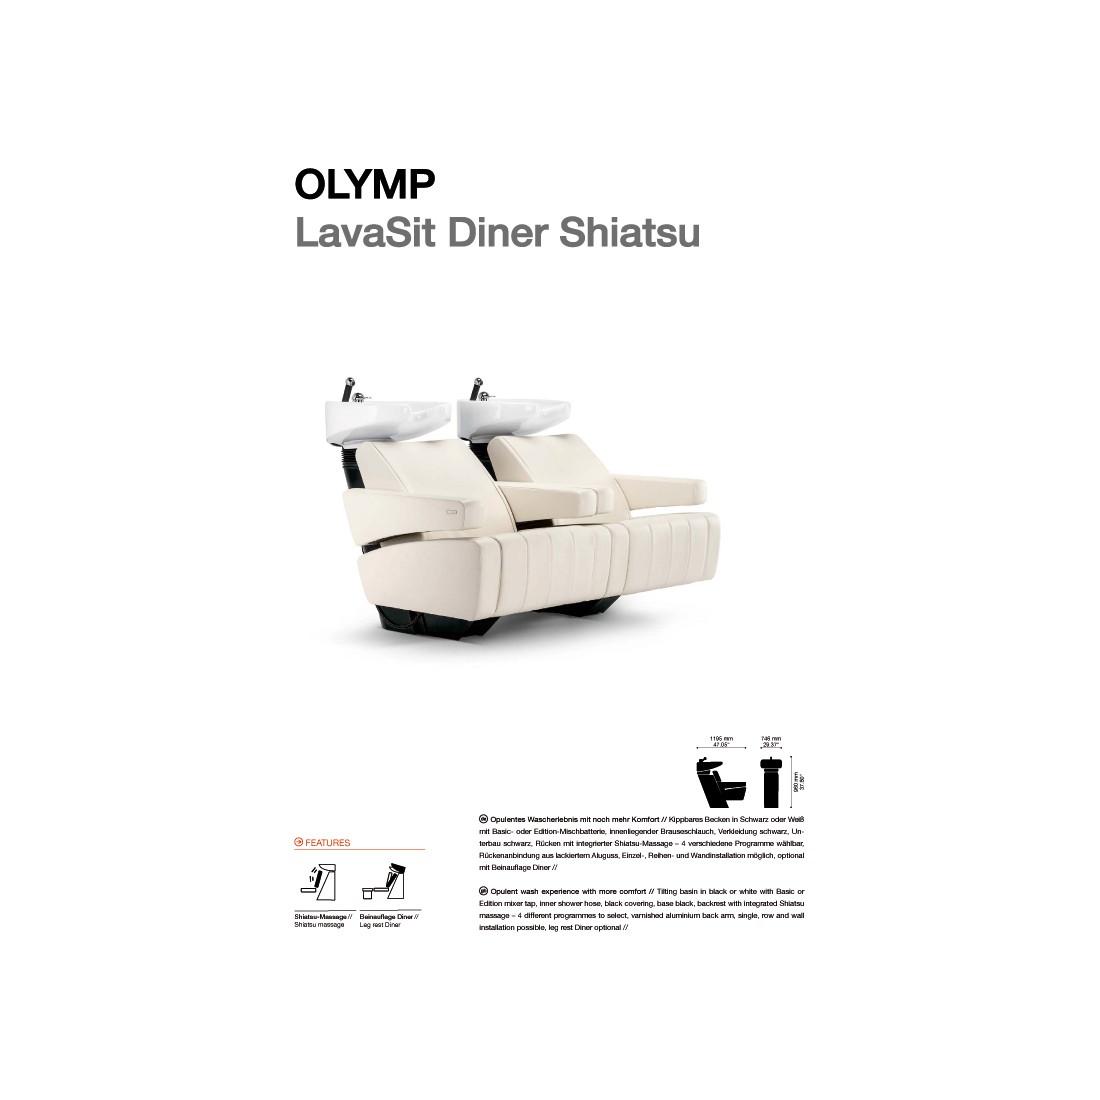 BAC A SHAMPOING OLYMP LAVASIT DINER SHIATSU